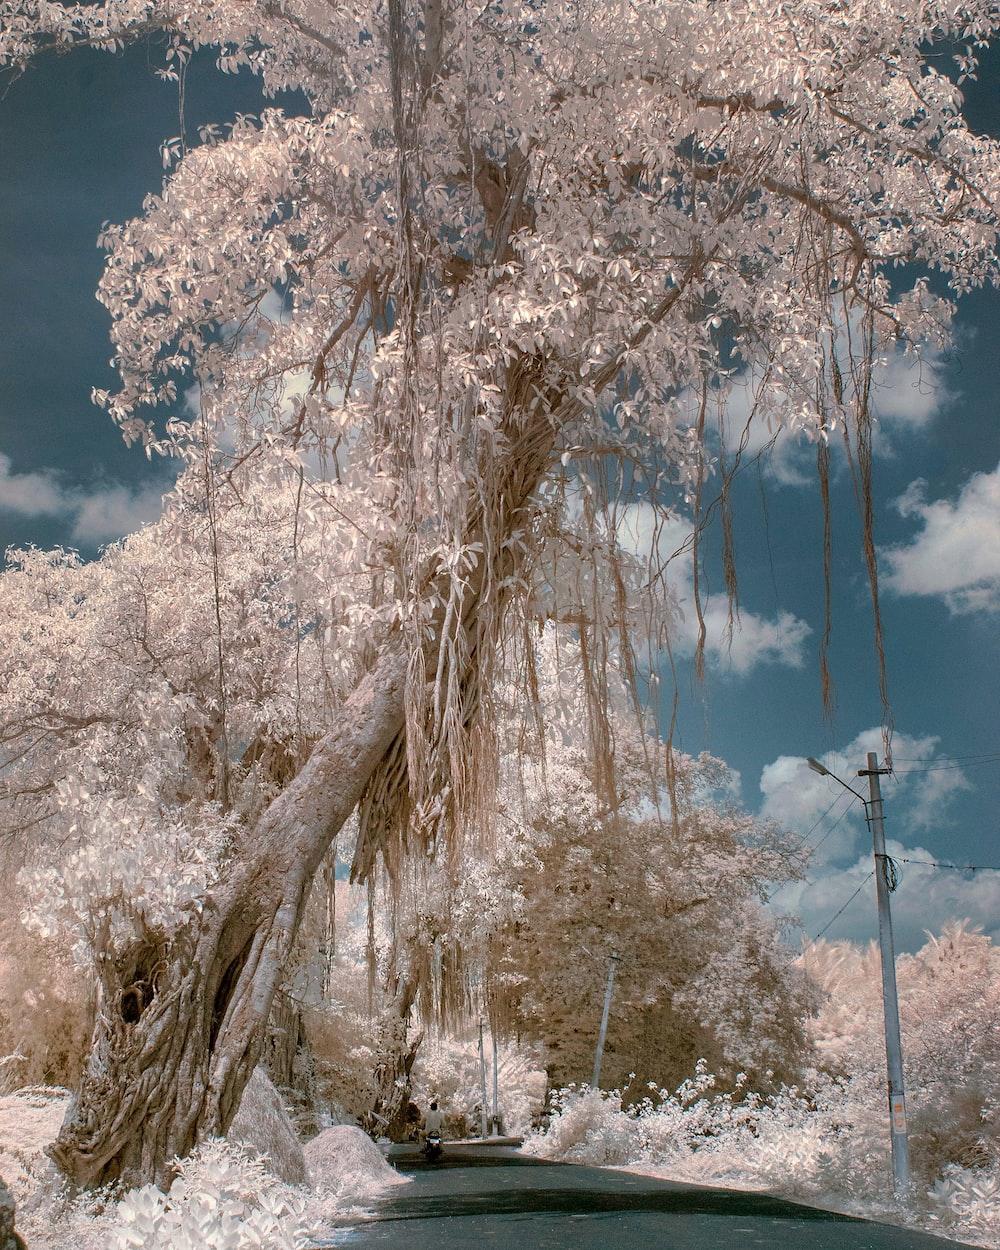 concrete road beside white-petaled tree